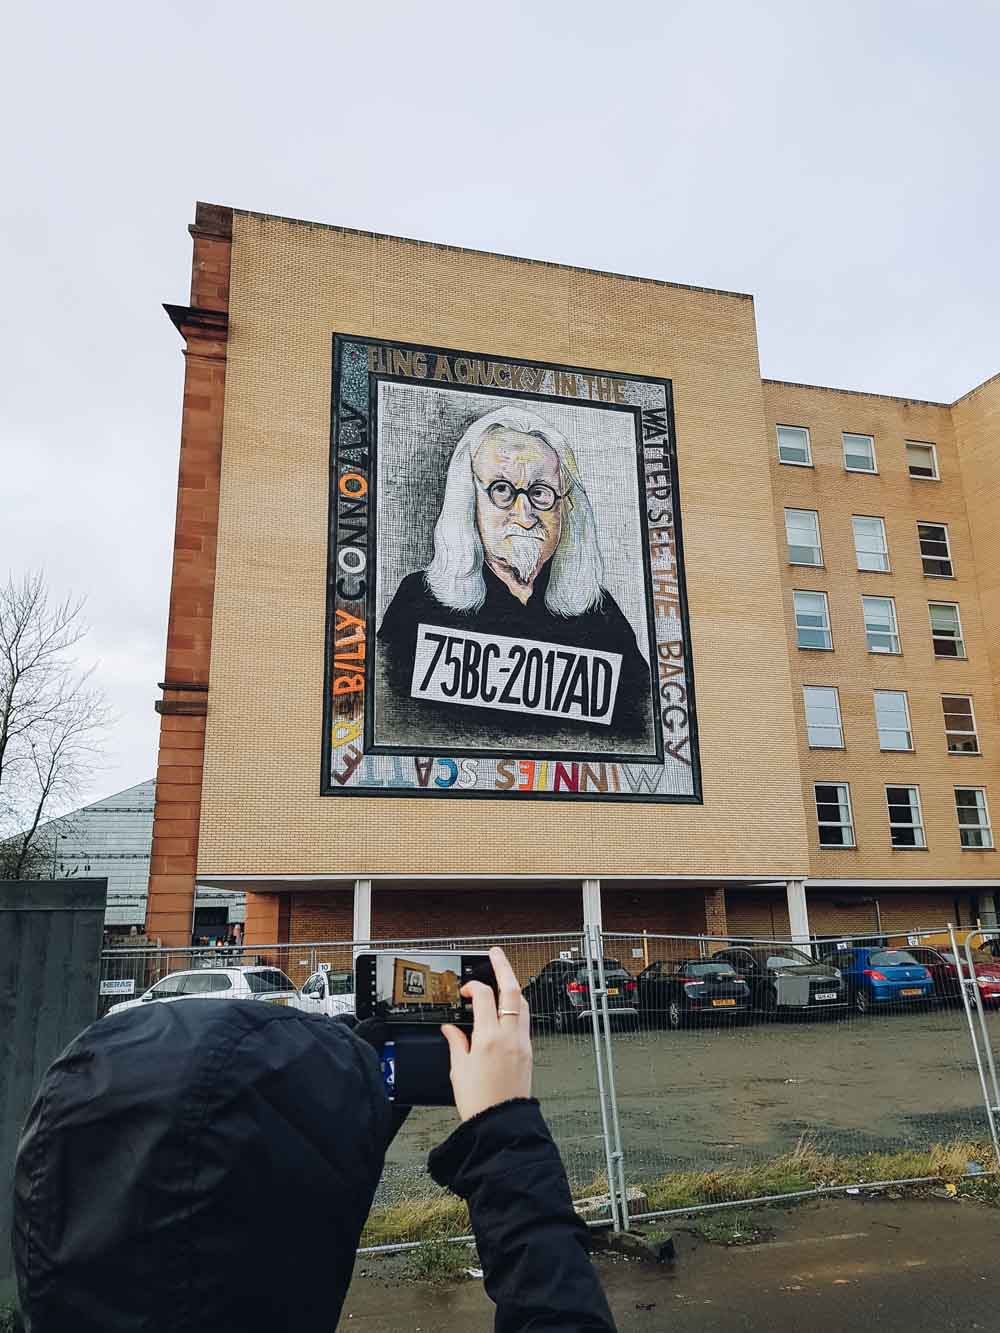 Billy Connolly, Osborne Street, Glasgow - Map of Joy